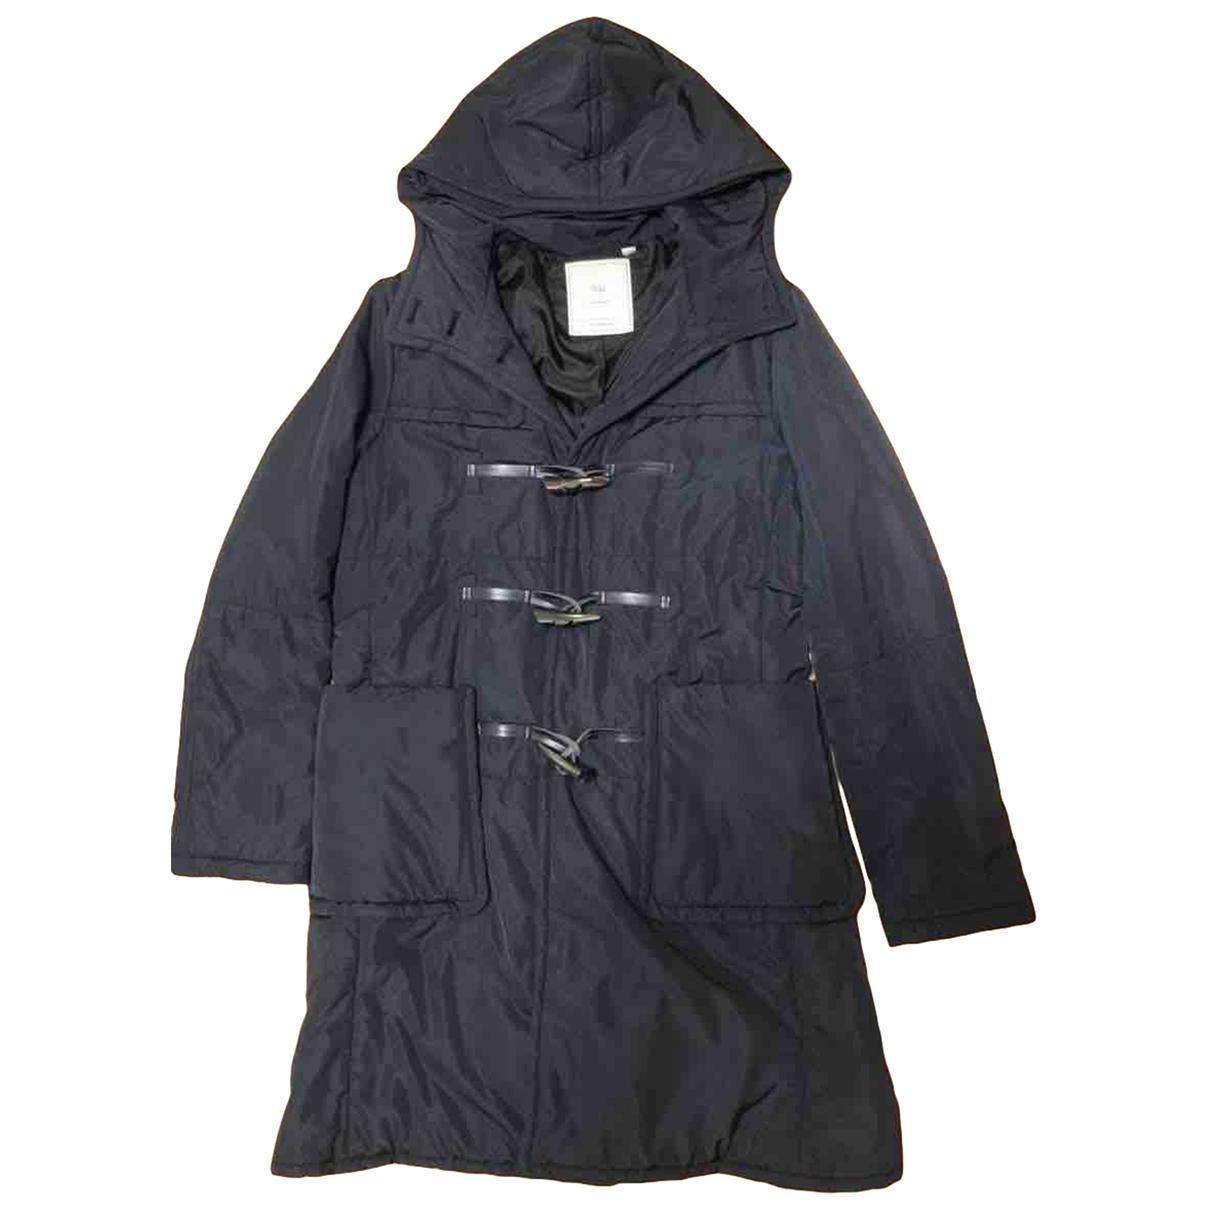 Uniqlo \N Black coat for Women 36 FR